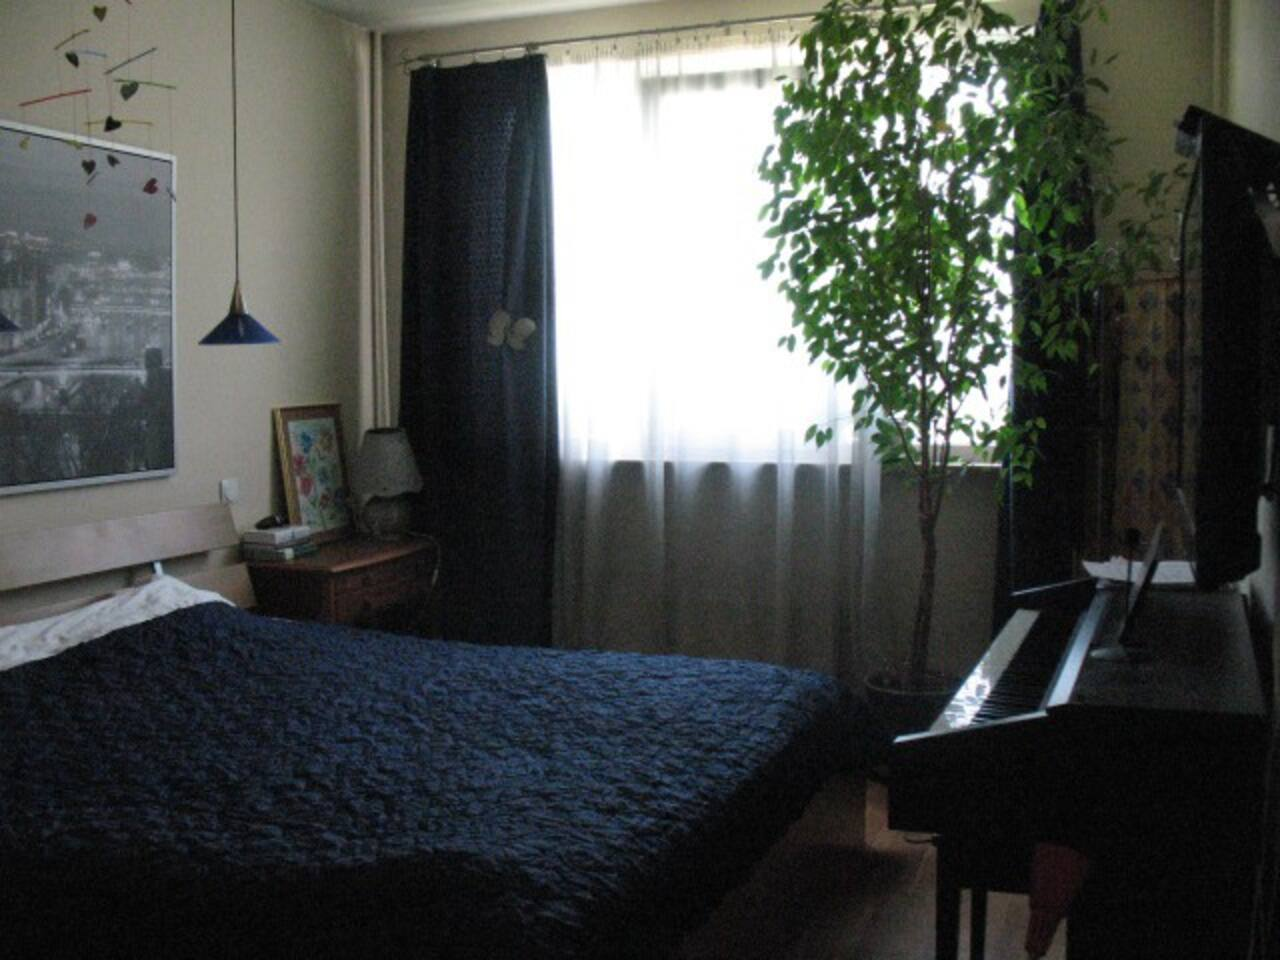 Bedroom for 2 persons with TV/спальня для 2 персон c ТВ